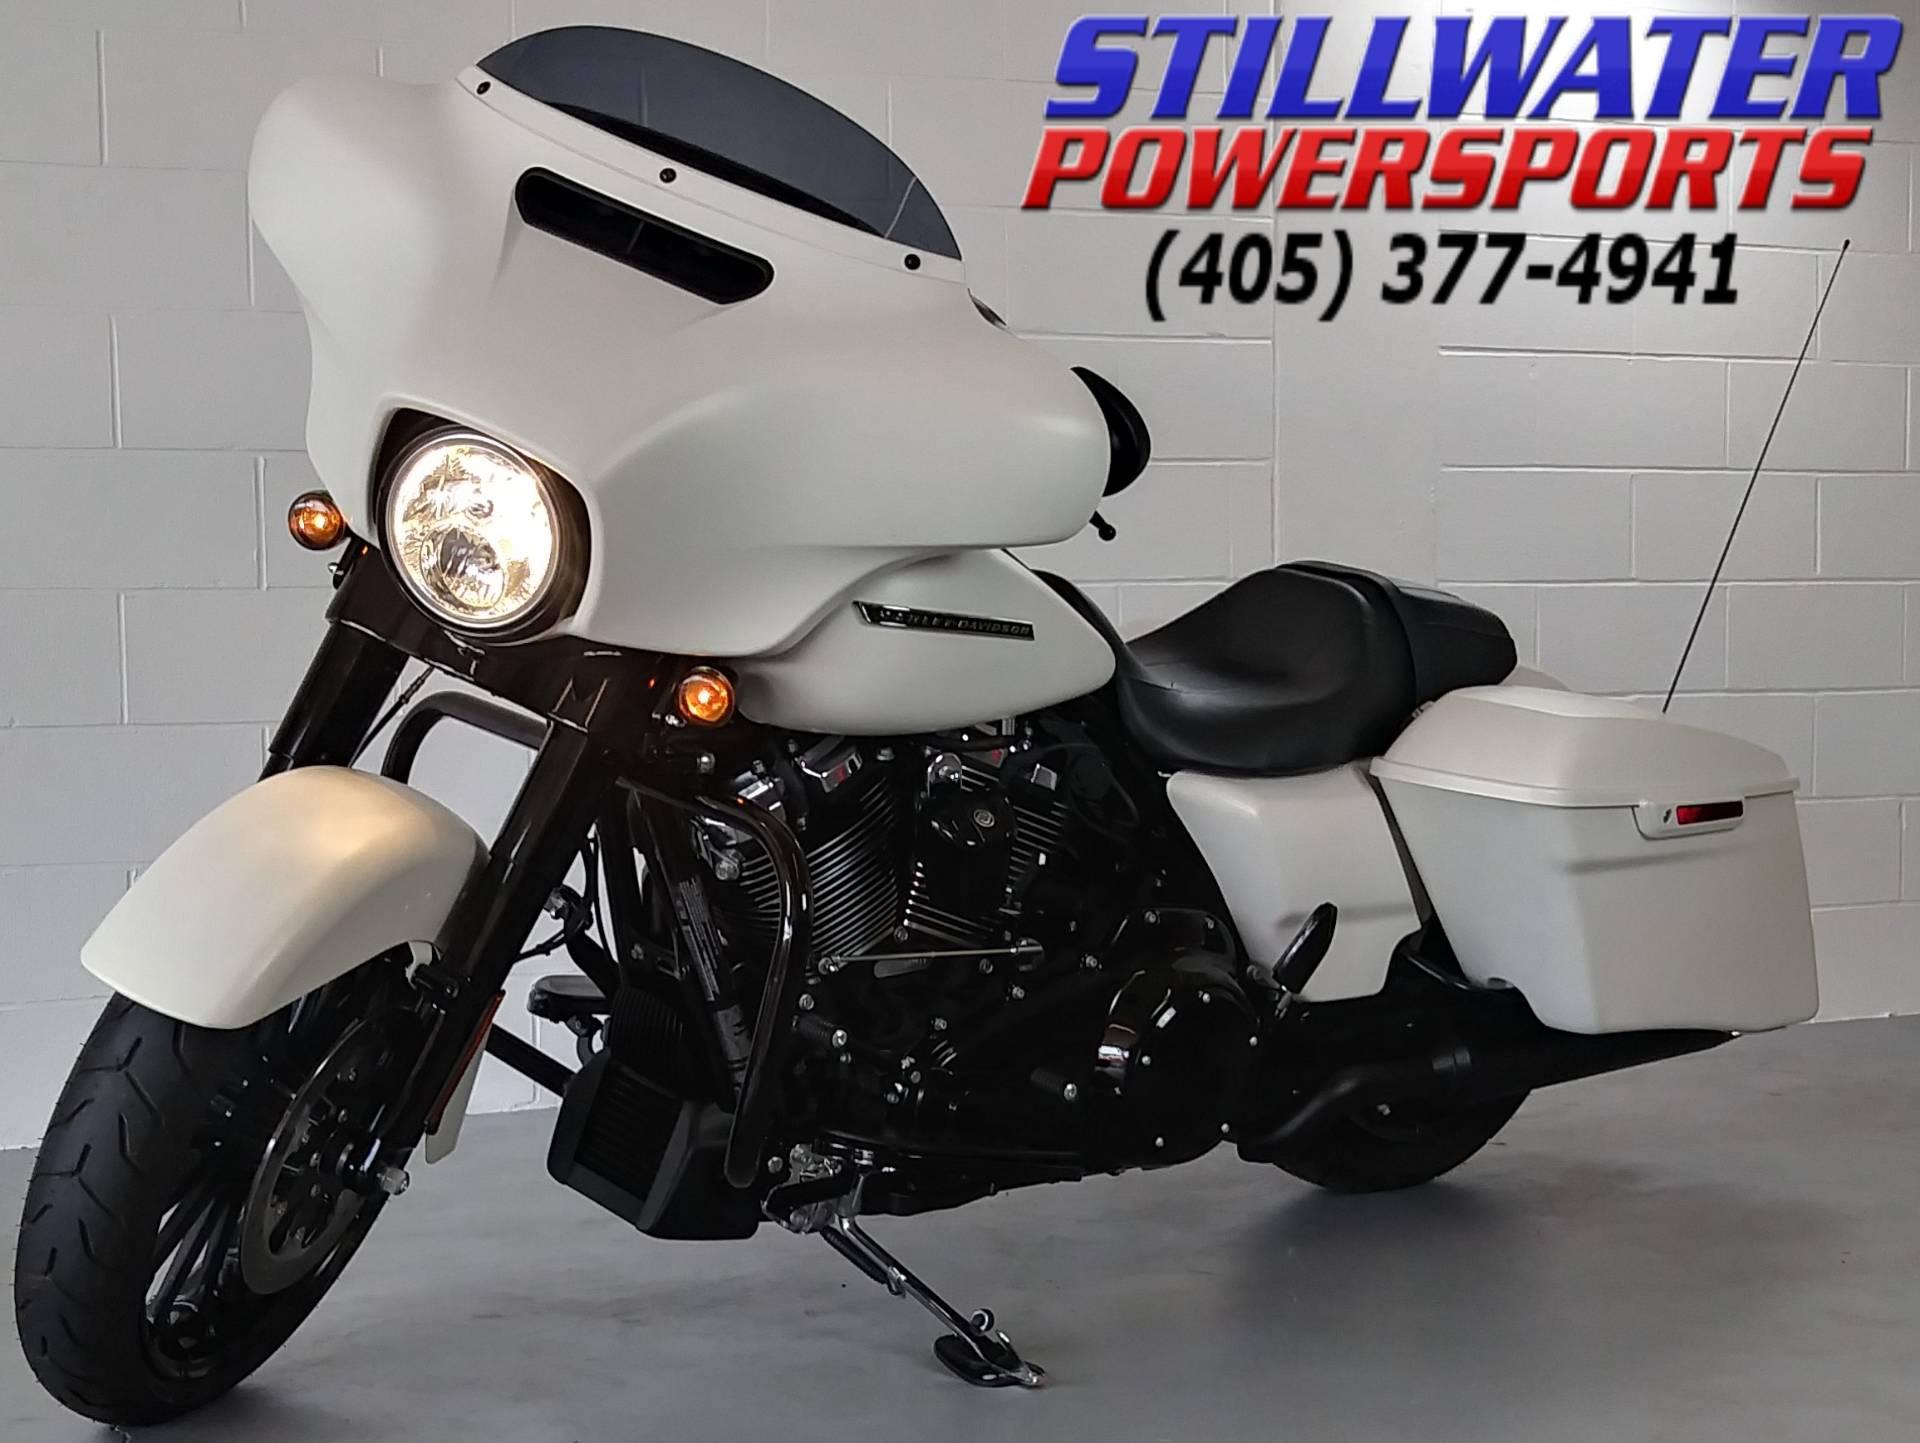 2018 Harley Davidson Street Glide In Stillwater Oklahoma